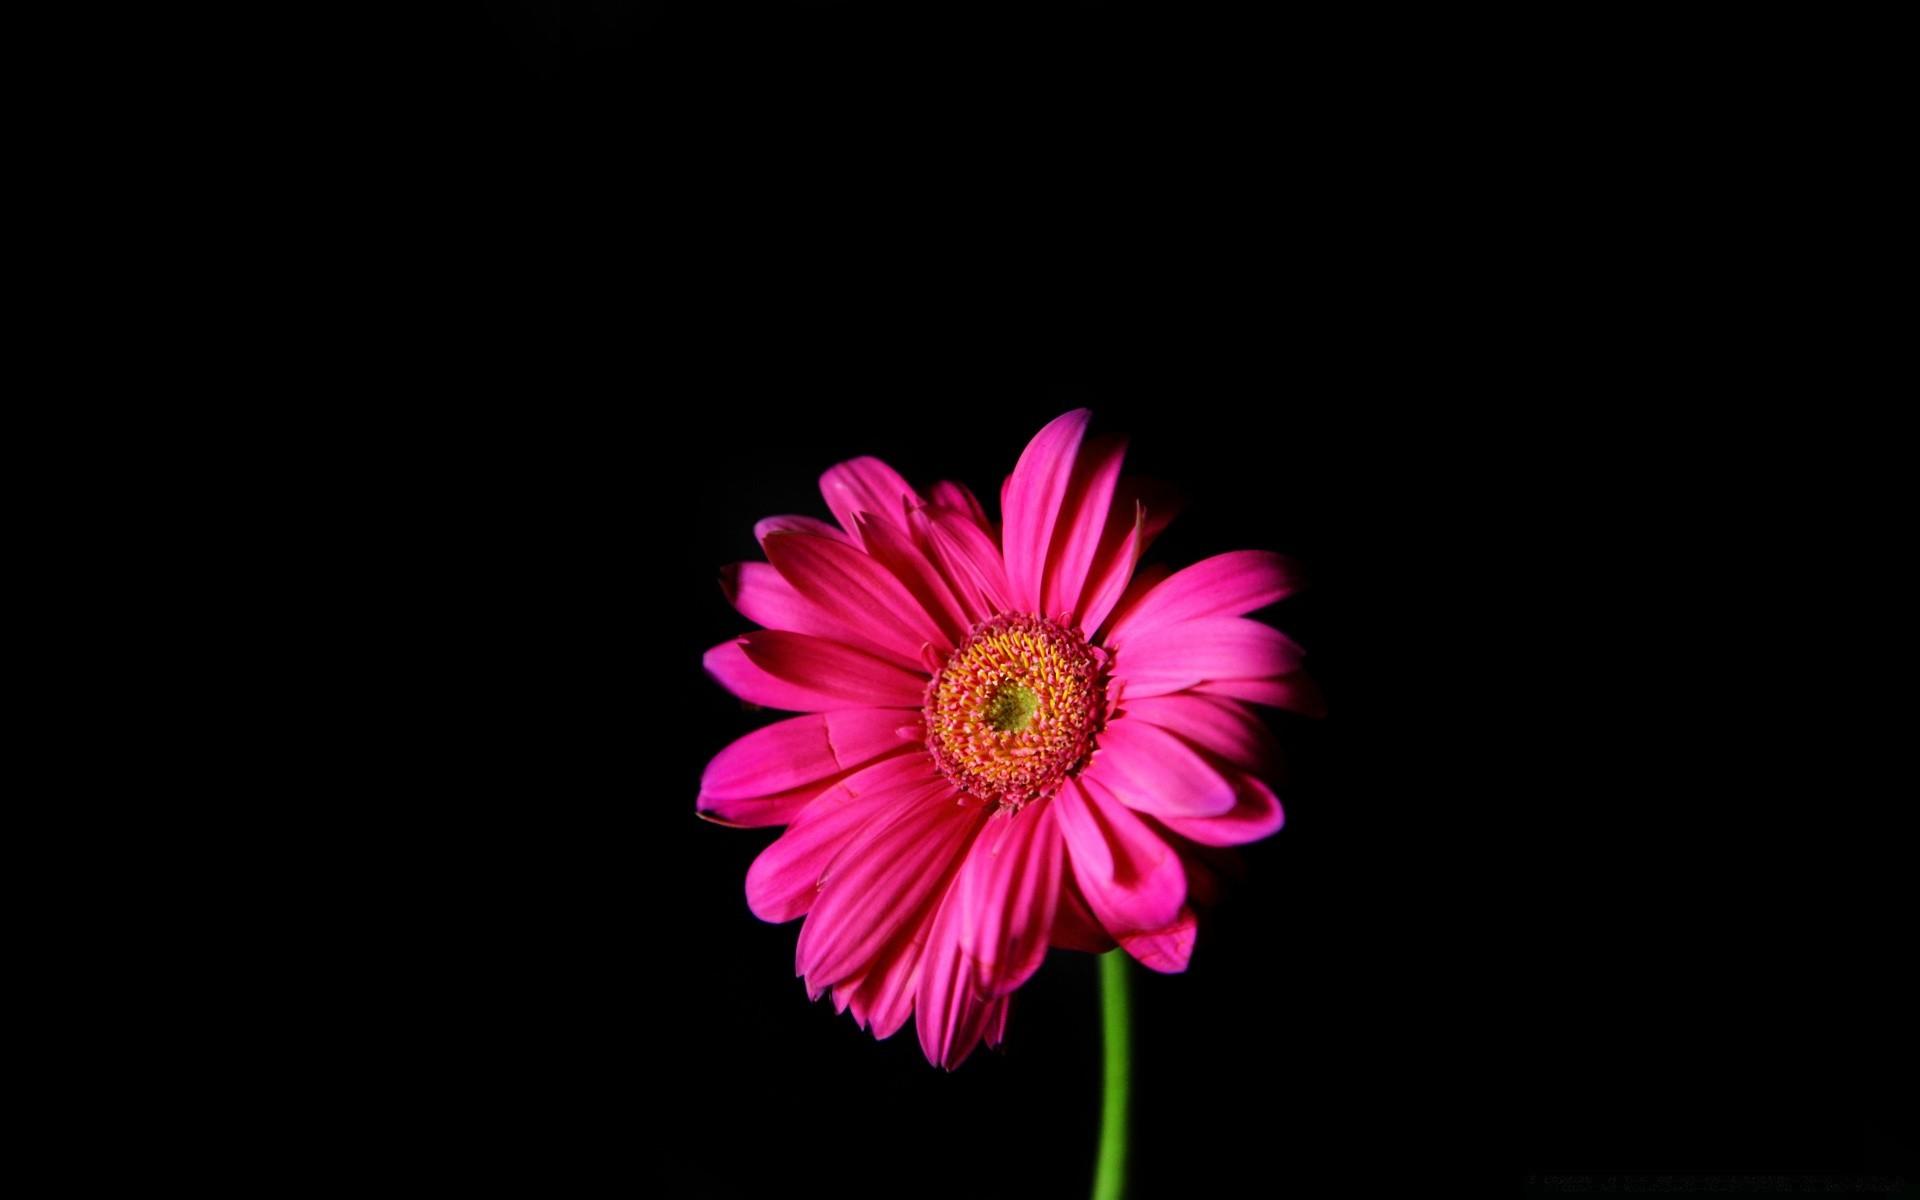 Hot Pink Gerber Daisy Phone Wallpapers